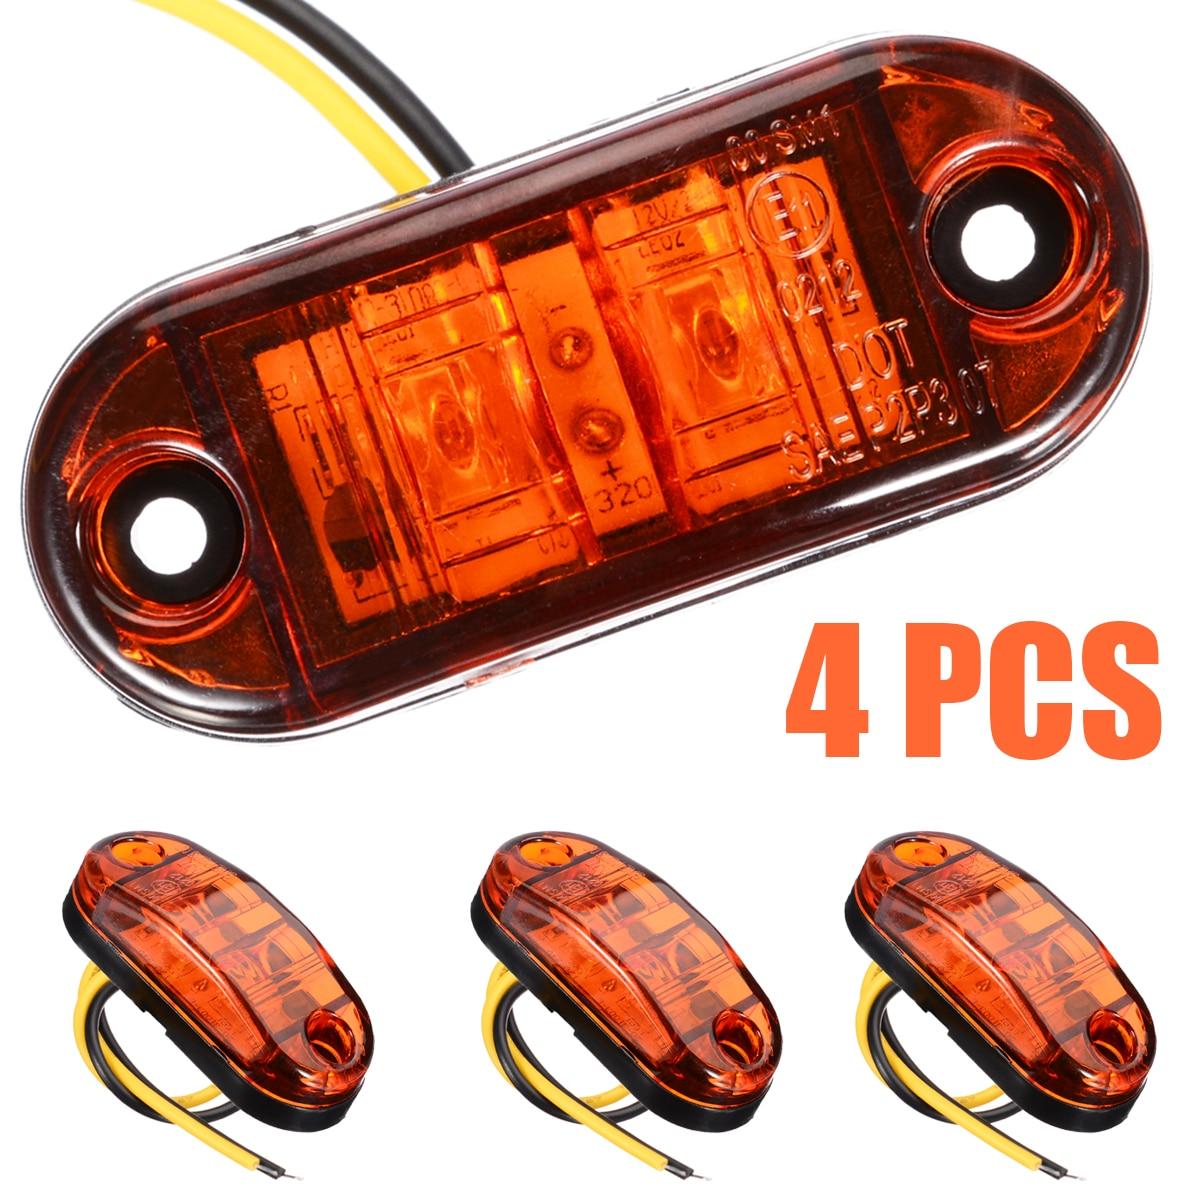 4Pcs 12V/24V 2LED Car Side Marker Light Trailer Truck Turn Signal Indicator Light Amber Car Truck Signal Light